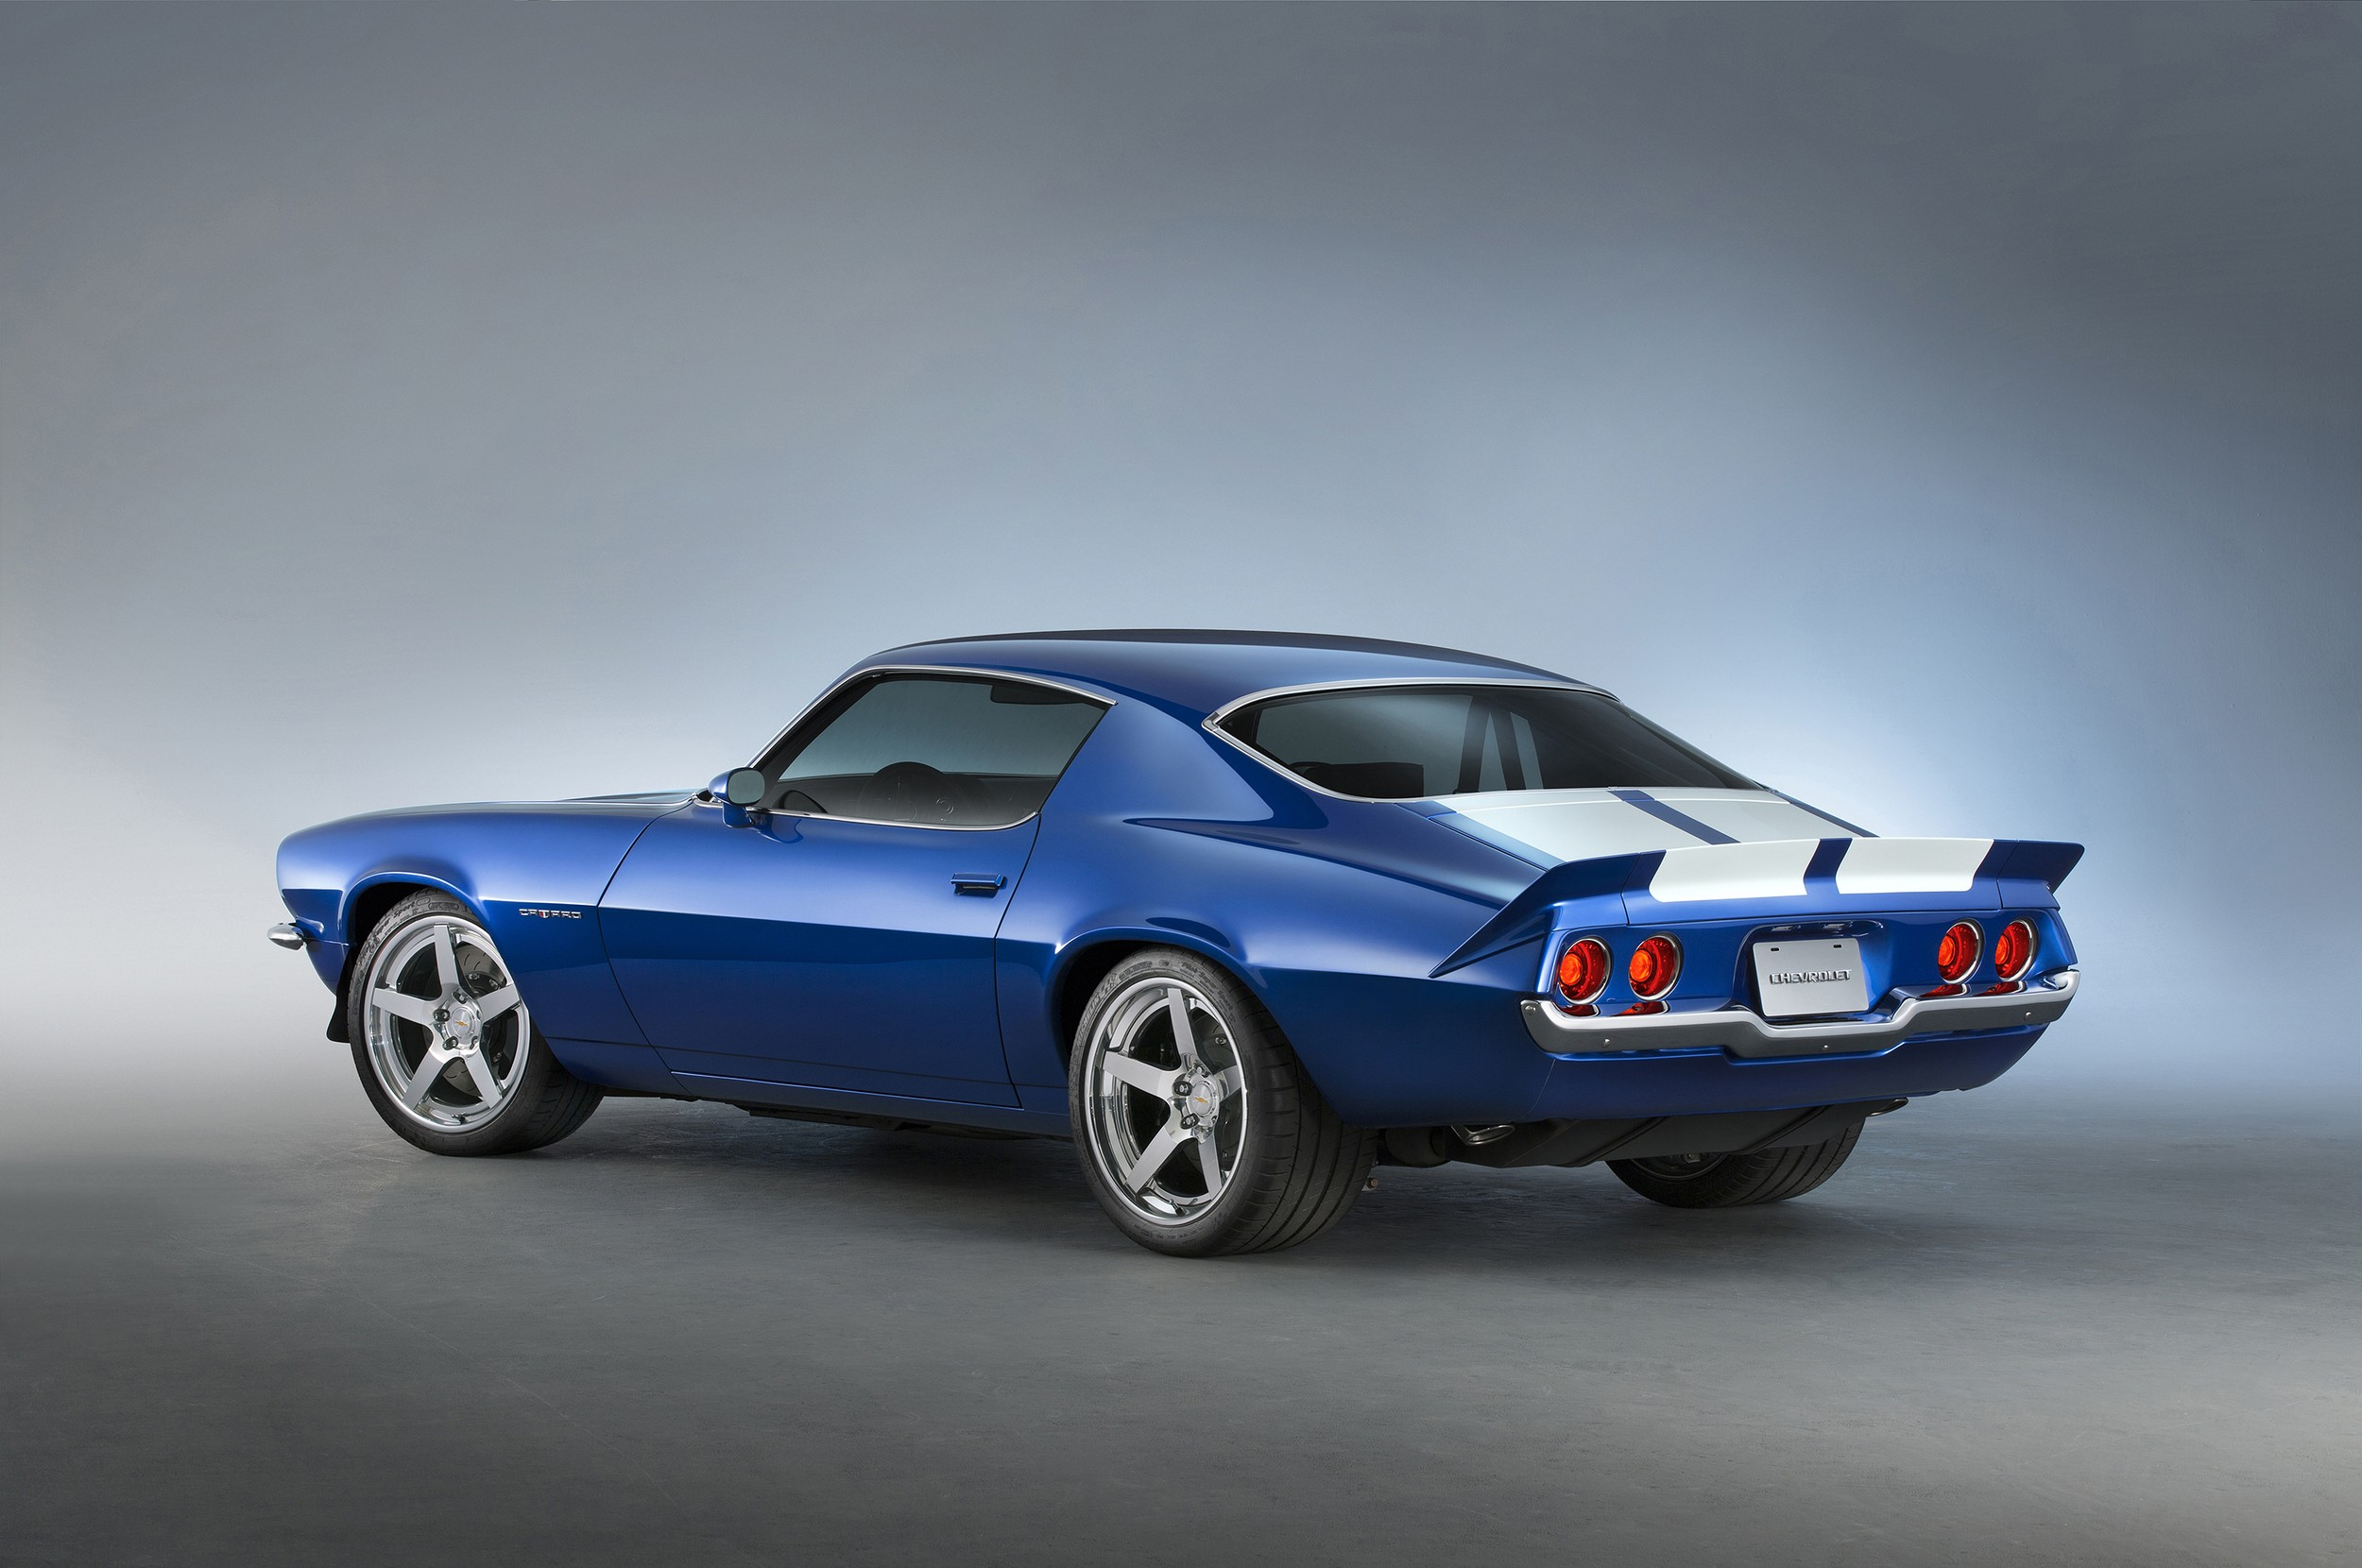 1970 Camaro Gets Corvette Z06 LT4 Supercharged V8 as Crate